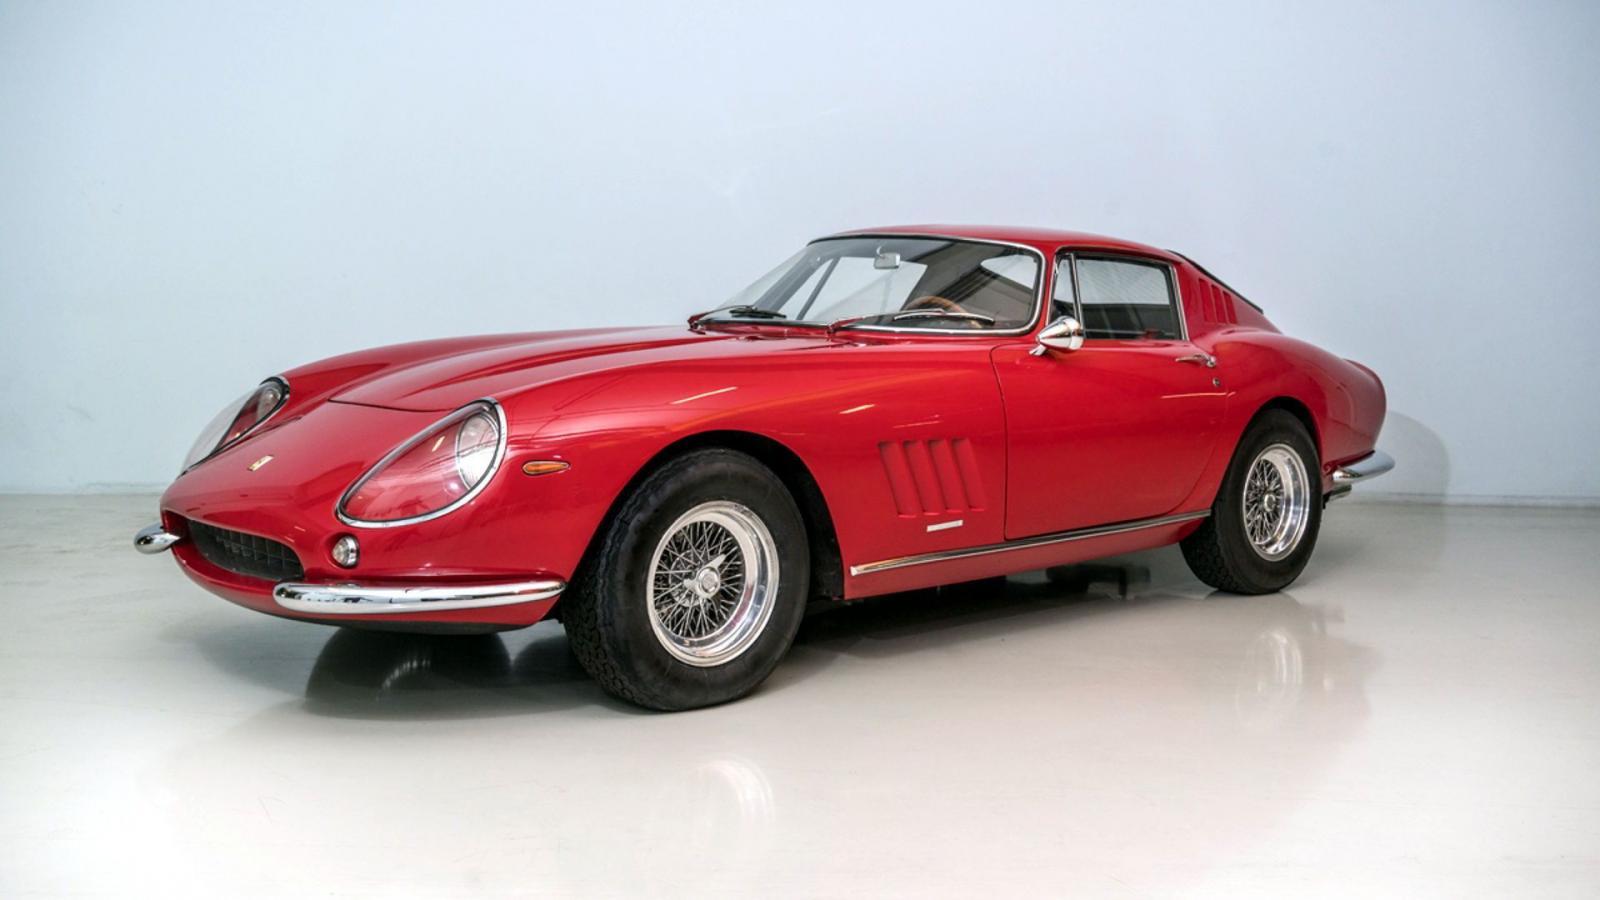 Ferrari 275 GTB/4 (1966) (примерно 3,2 млн долларов)